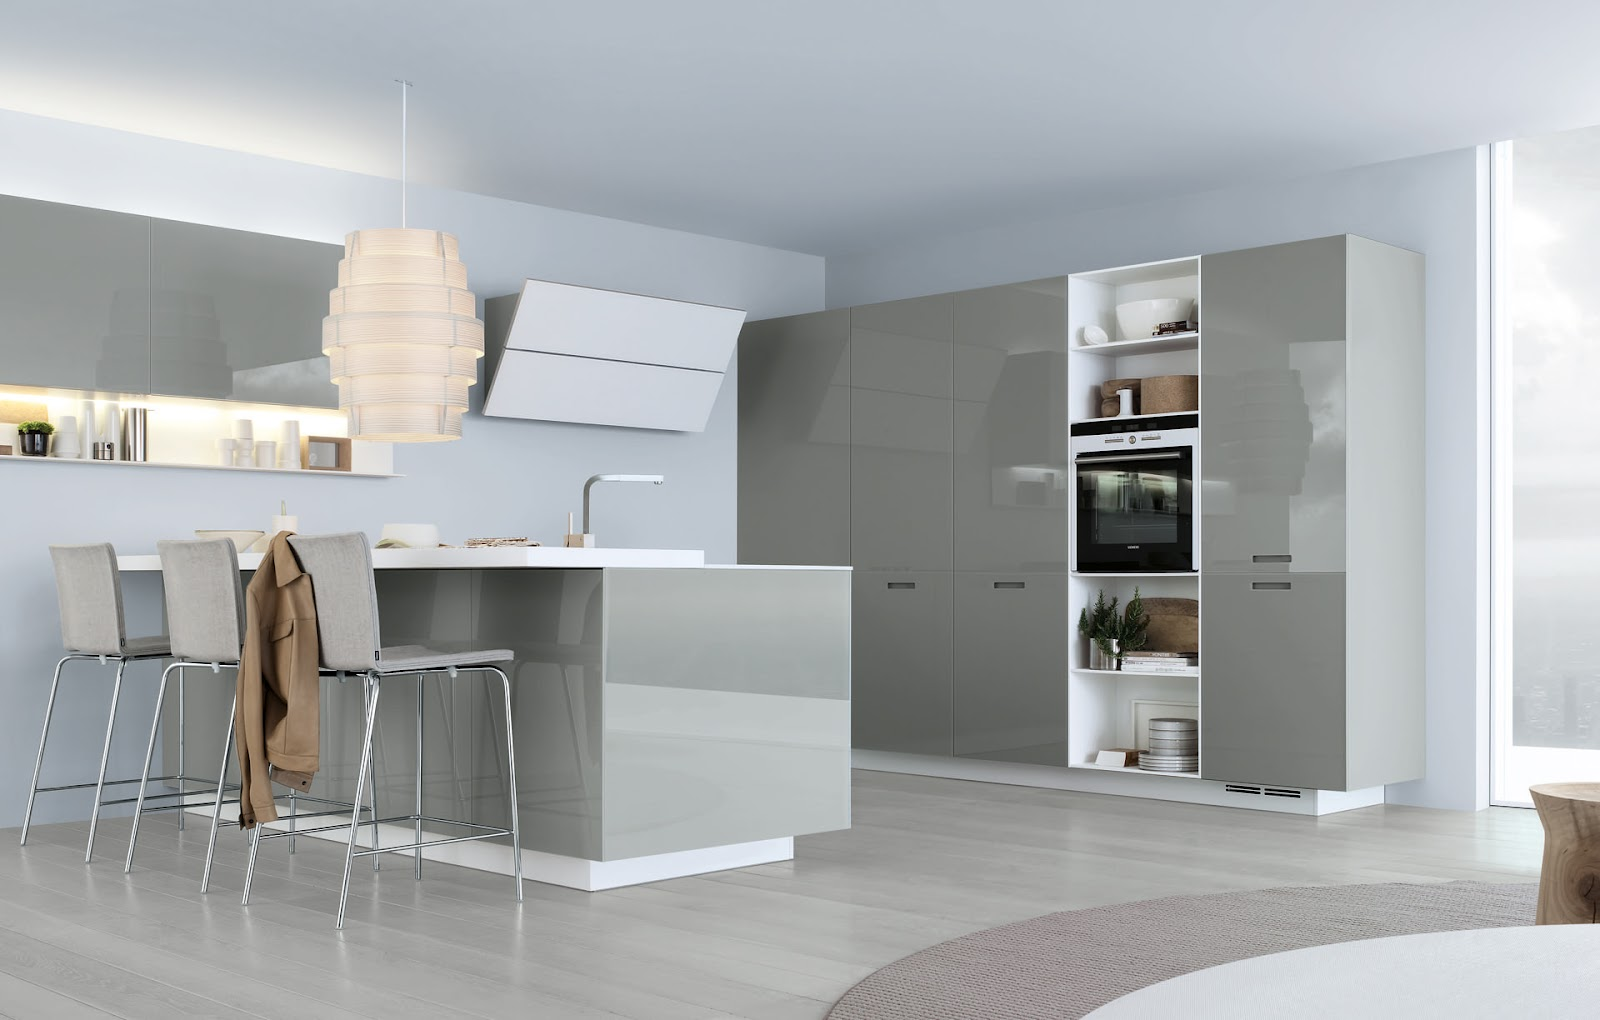 Kyton Varenna Poliform Giving Simplicity And Freedom For Your Kitchen  #604D3C 1600 1020 Veneta Cucine O Varenna